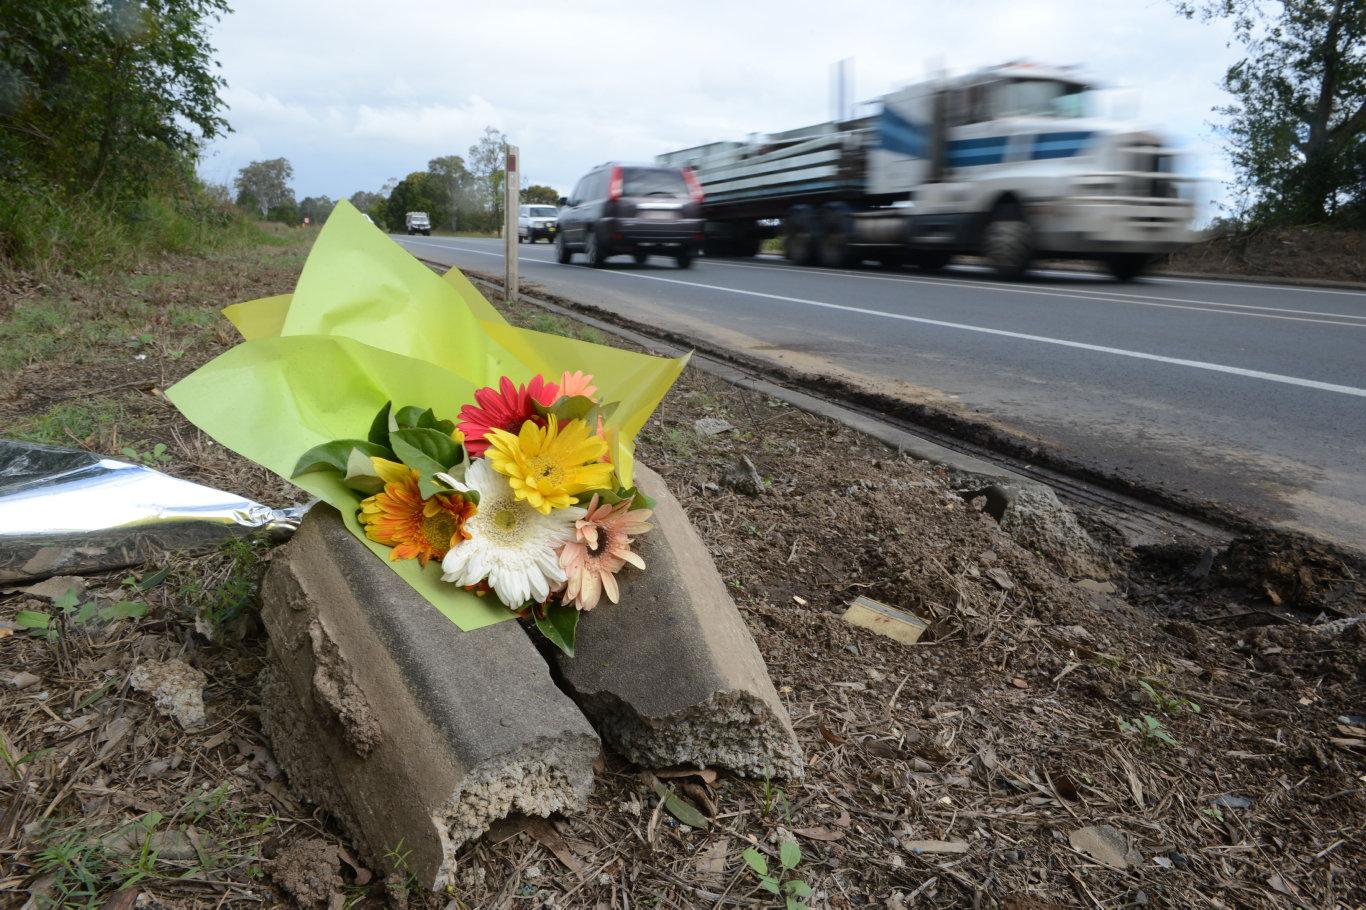 A man has died in hospital following a car crash on a highway.